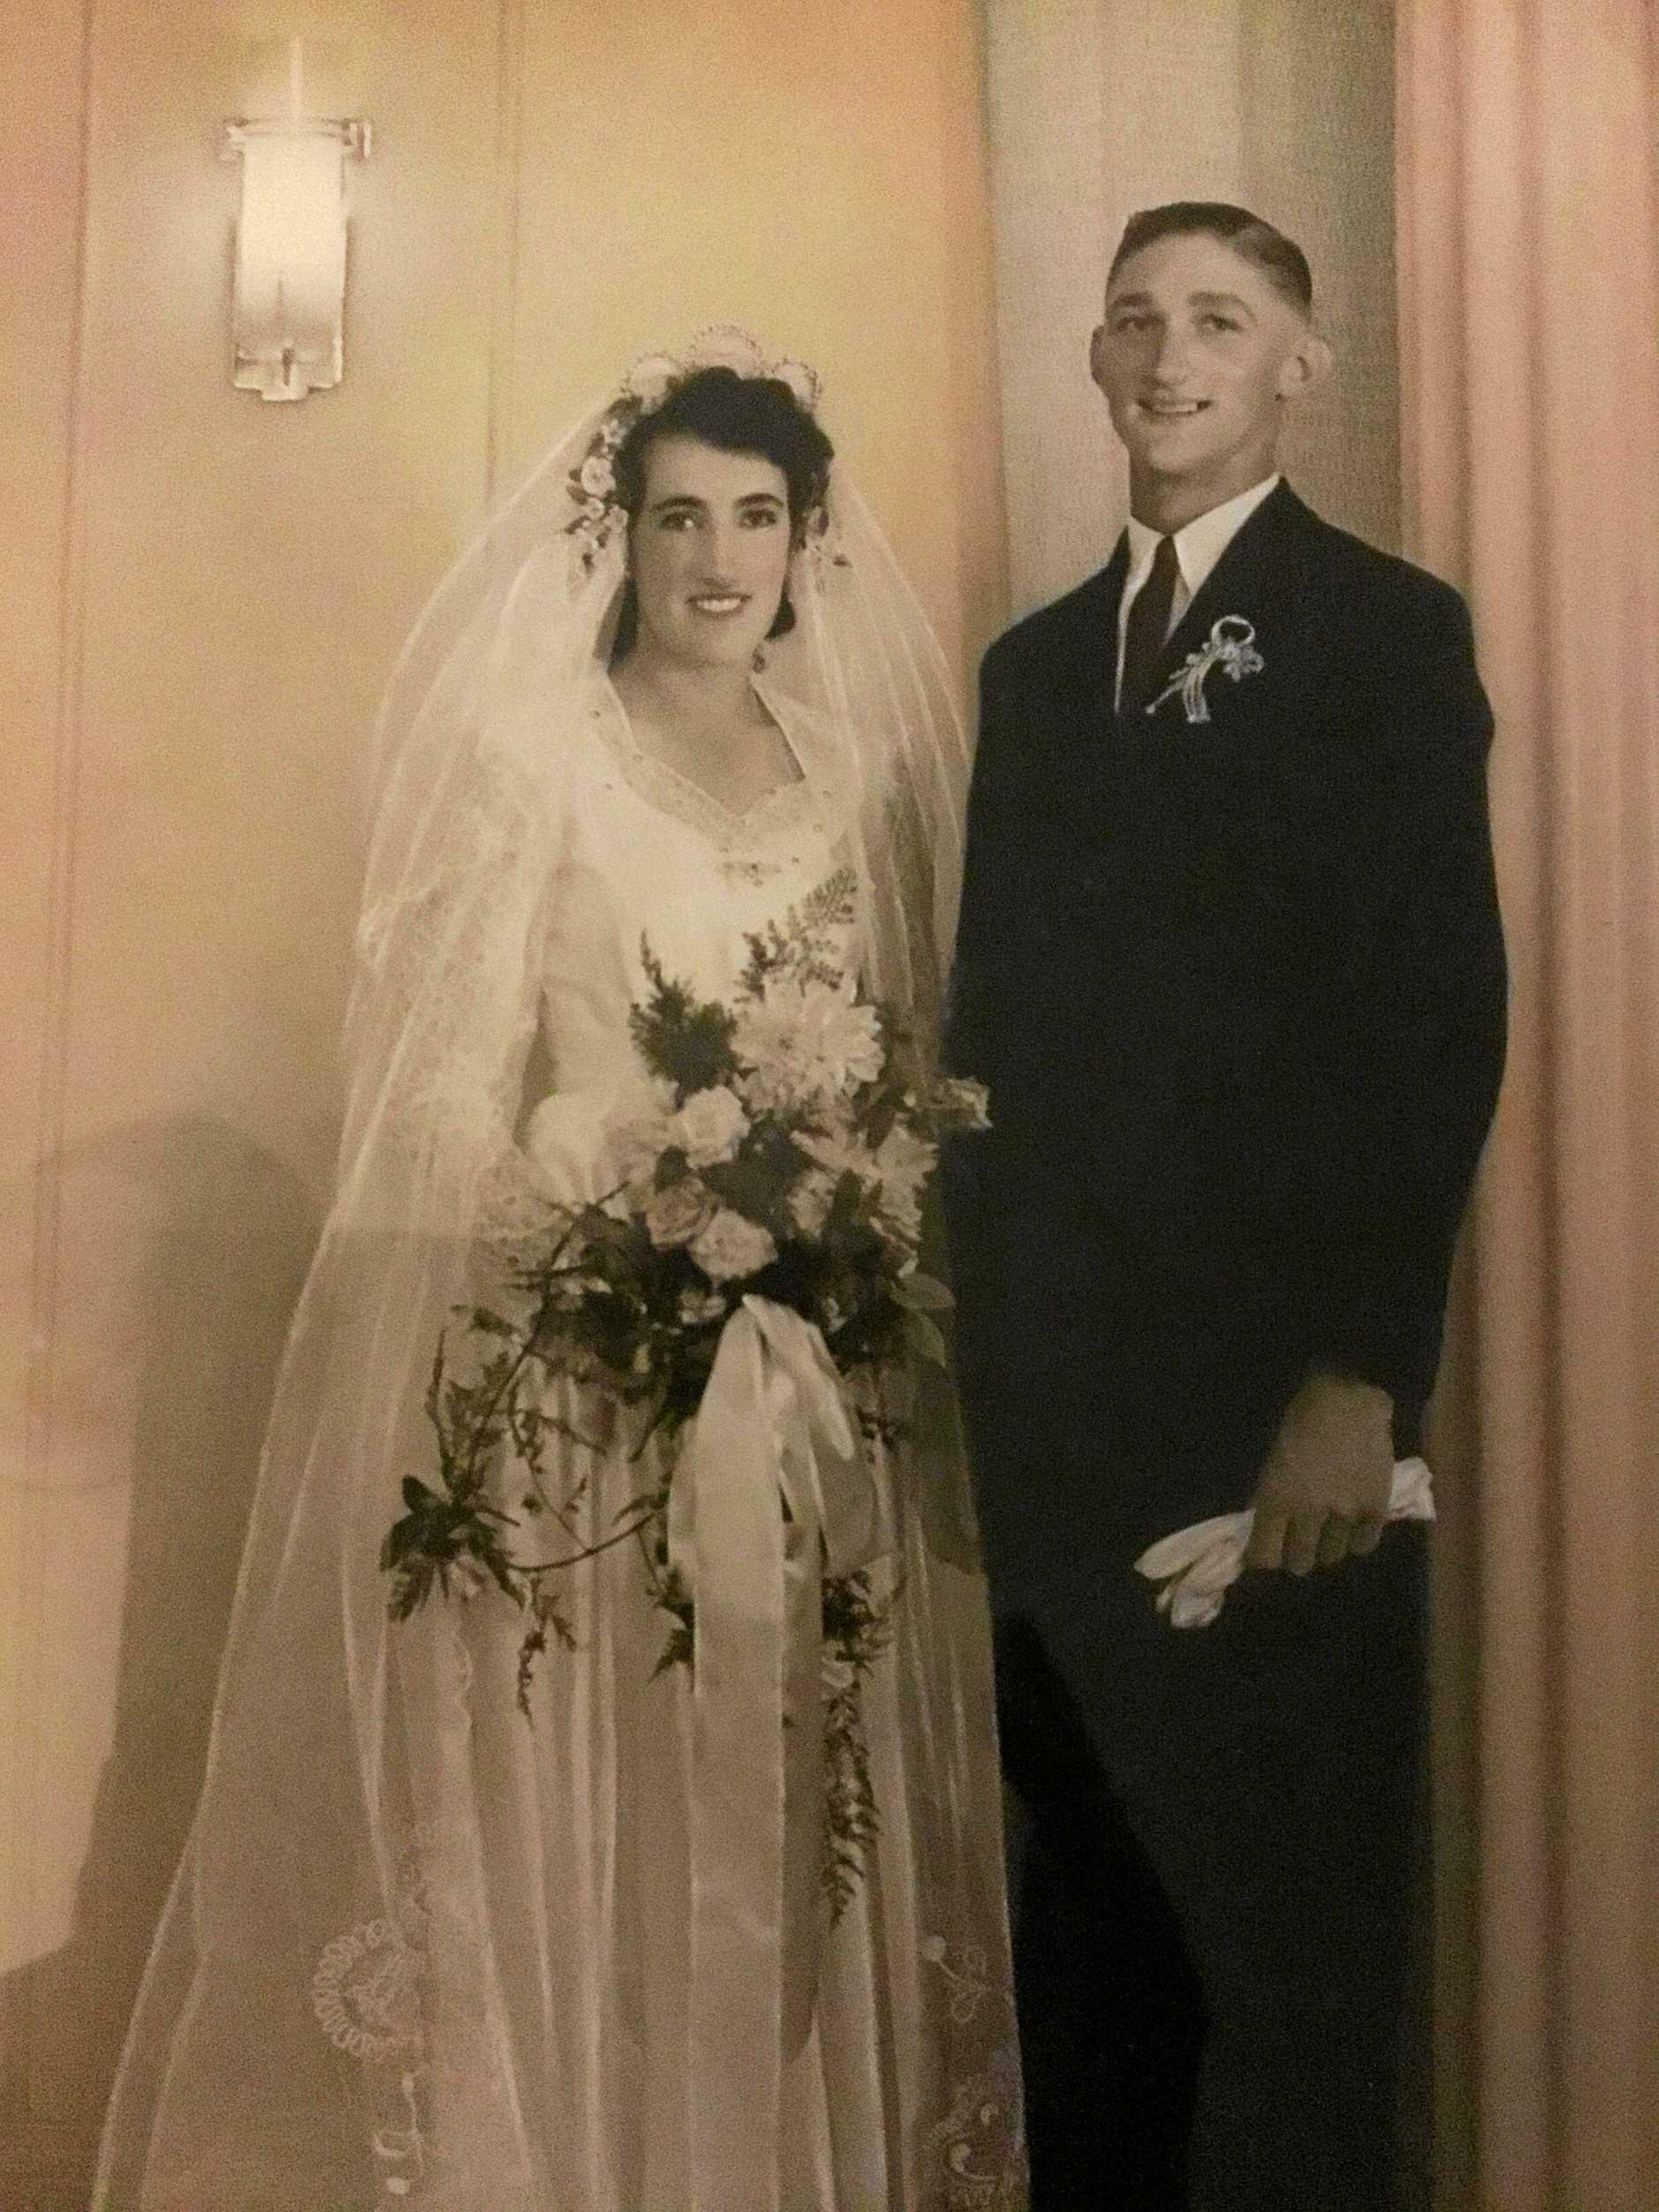 LOVE: Jean and Herbert (Bob) Little were married on February 5, 1949.